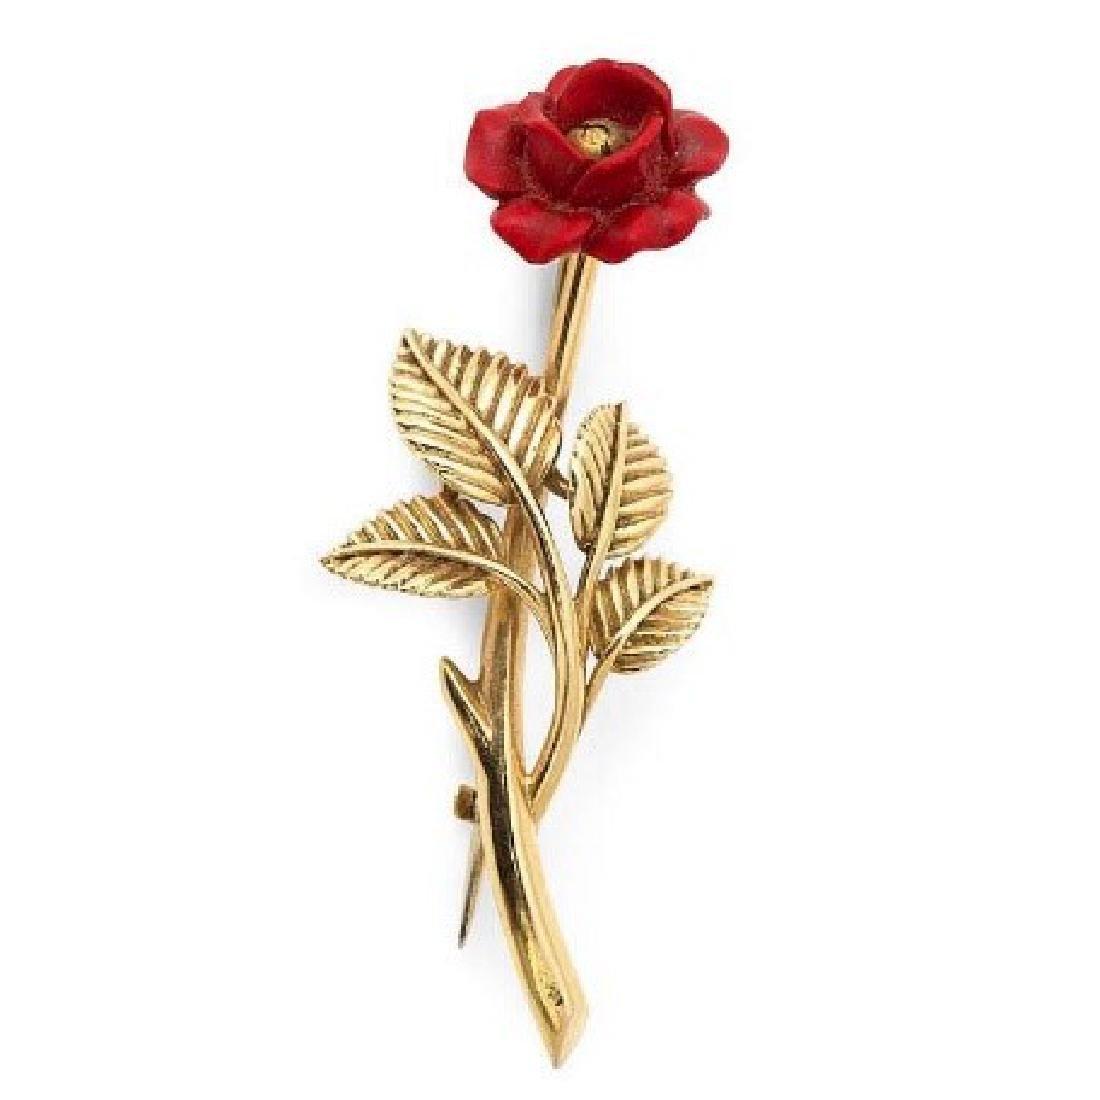 Fred Paris Oxblood Coral Rose Pin